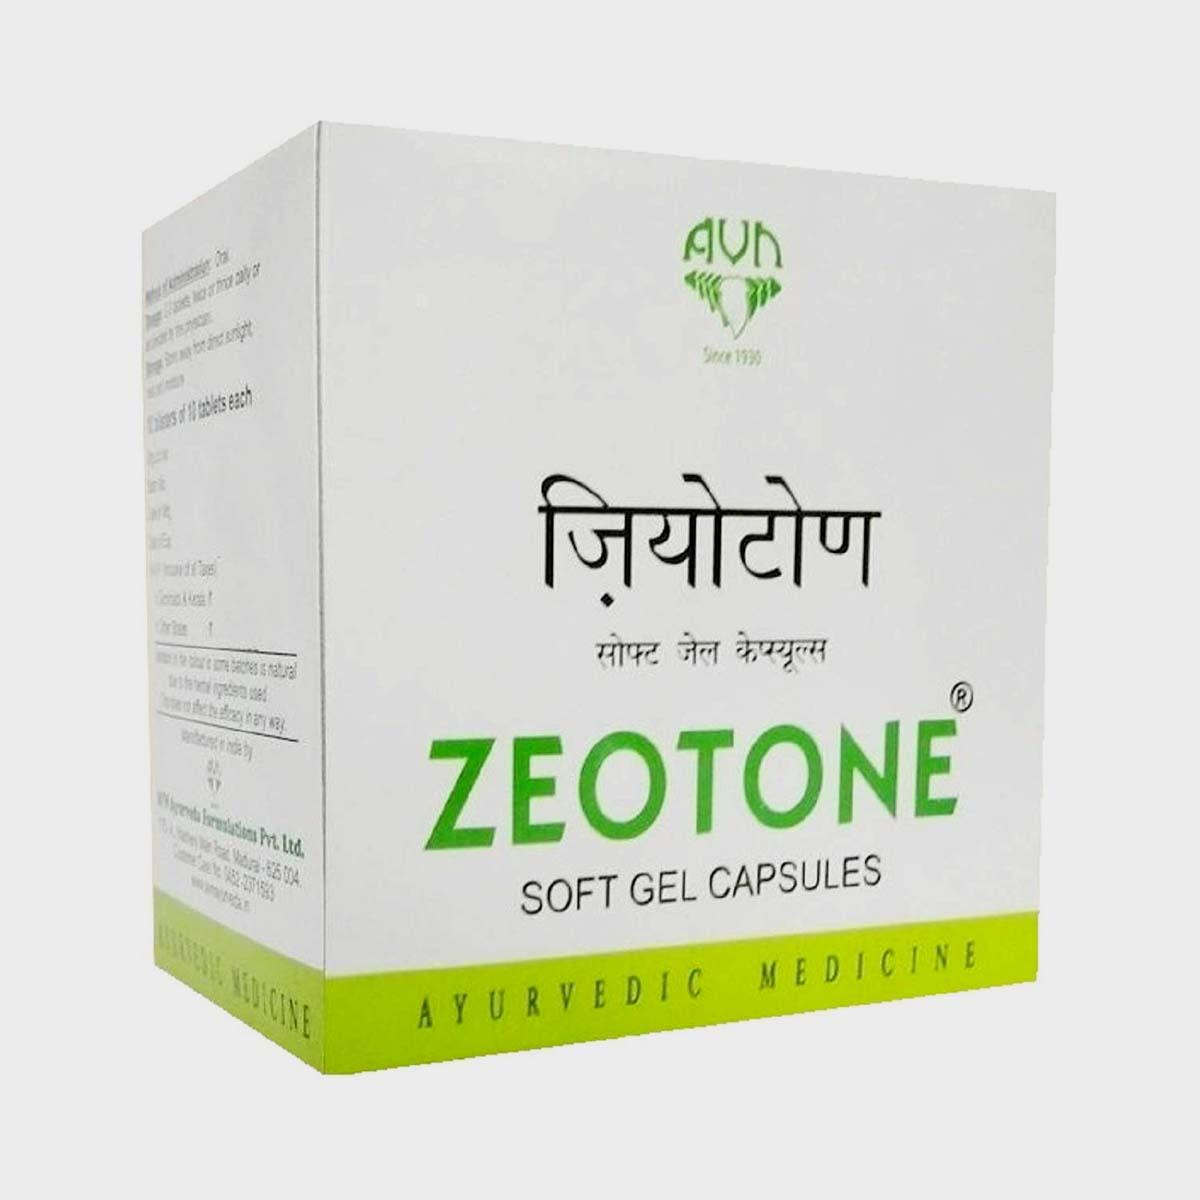 AVN Zeotone Plus Soft Gel Capsules Price in India